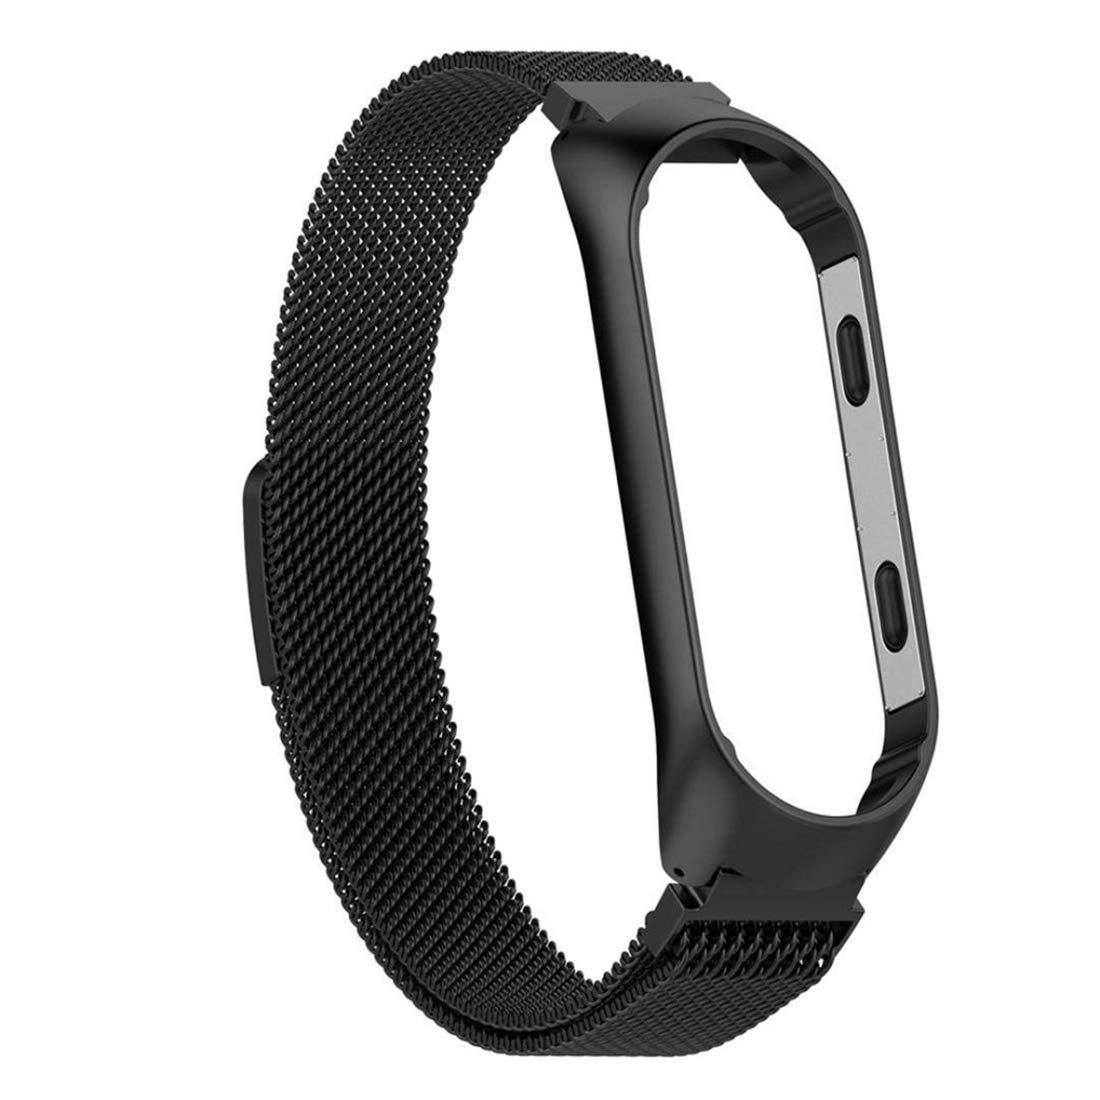 Xiaomi Mi Band 3 Armband Onlyct Ersatzband Edelstahl Strap Schlaufenarmband Magnet Uhrenarmband Replacement Metall Armband f/ür Xiaomi Mi Band 3 L, Schwarz